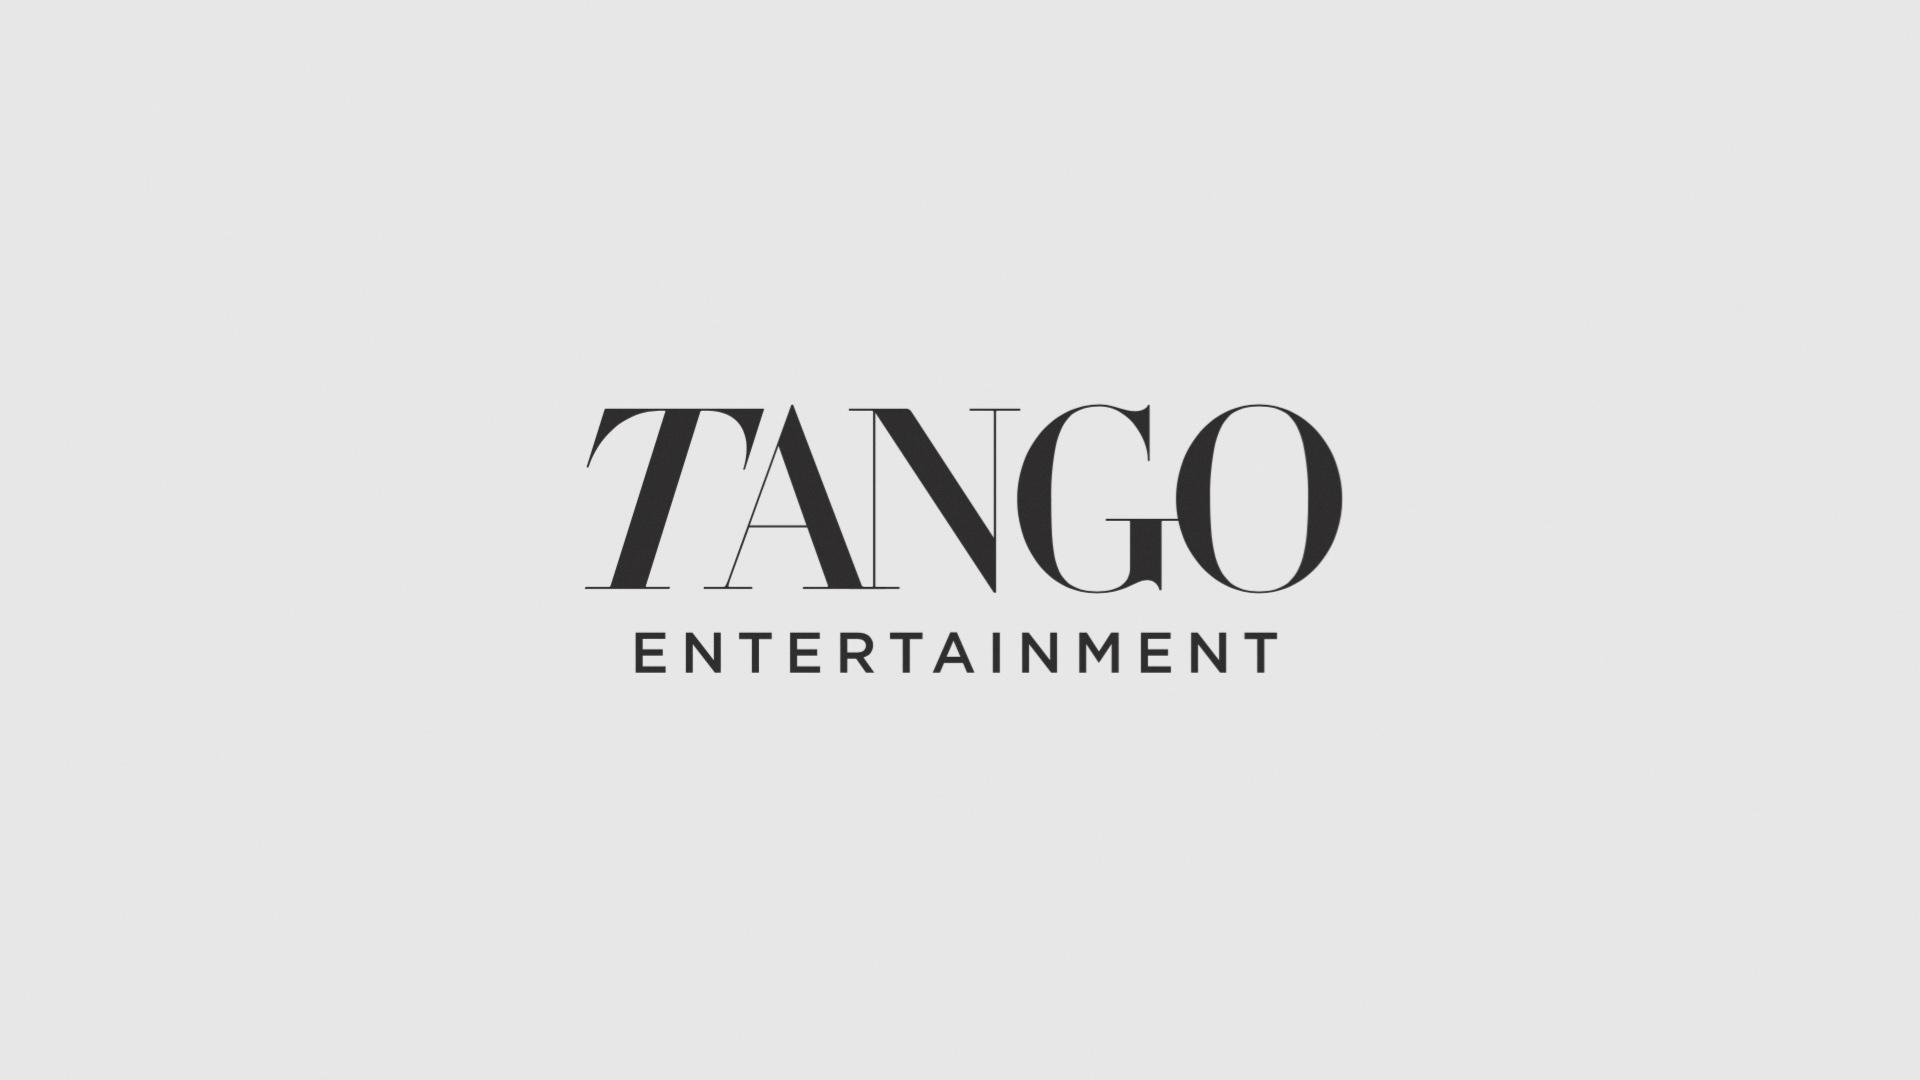 Tango Entertainment - Alphonse Swinehart